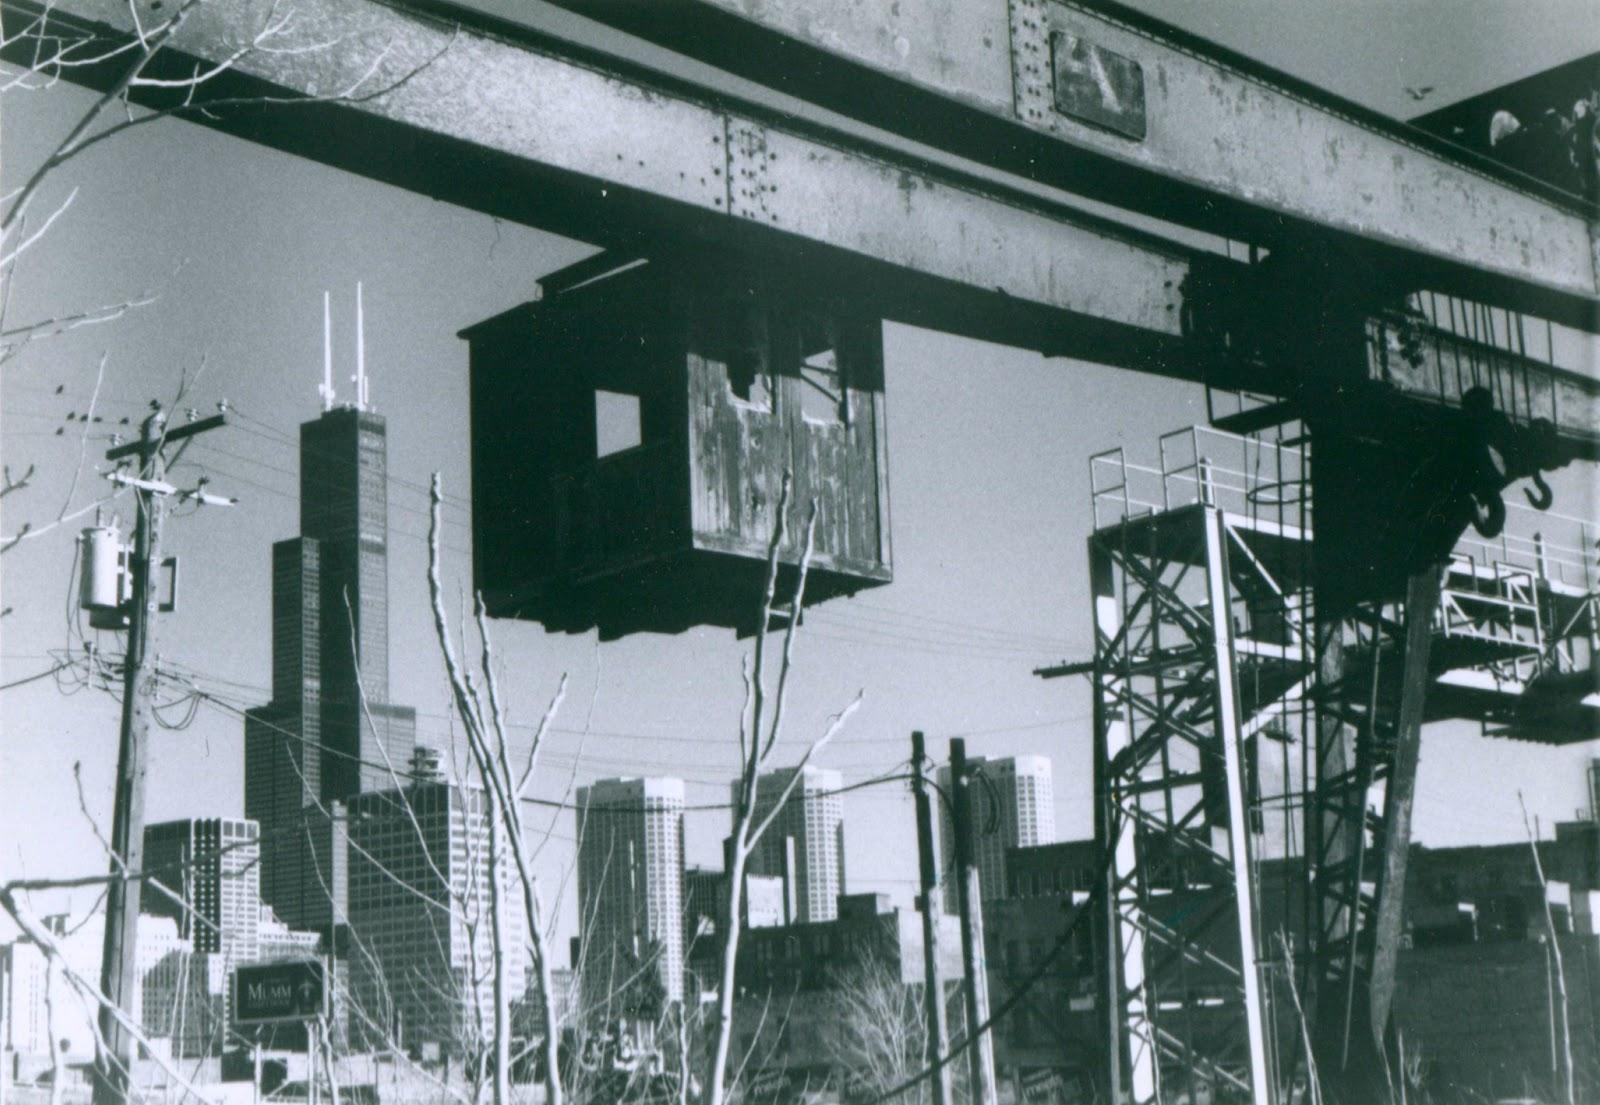 essay on urban frontier